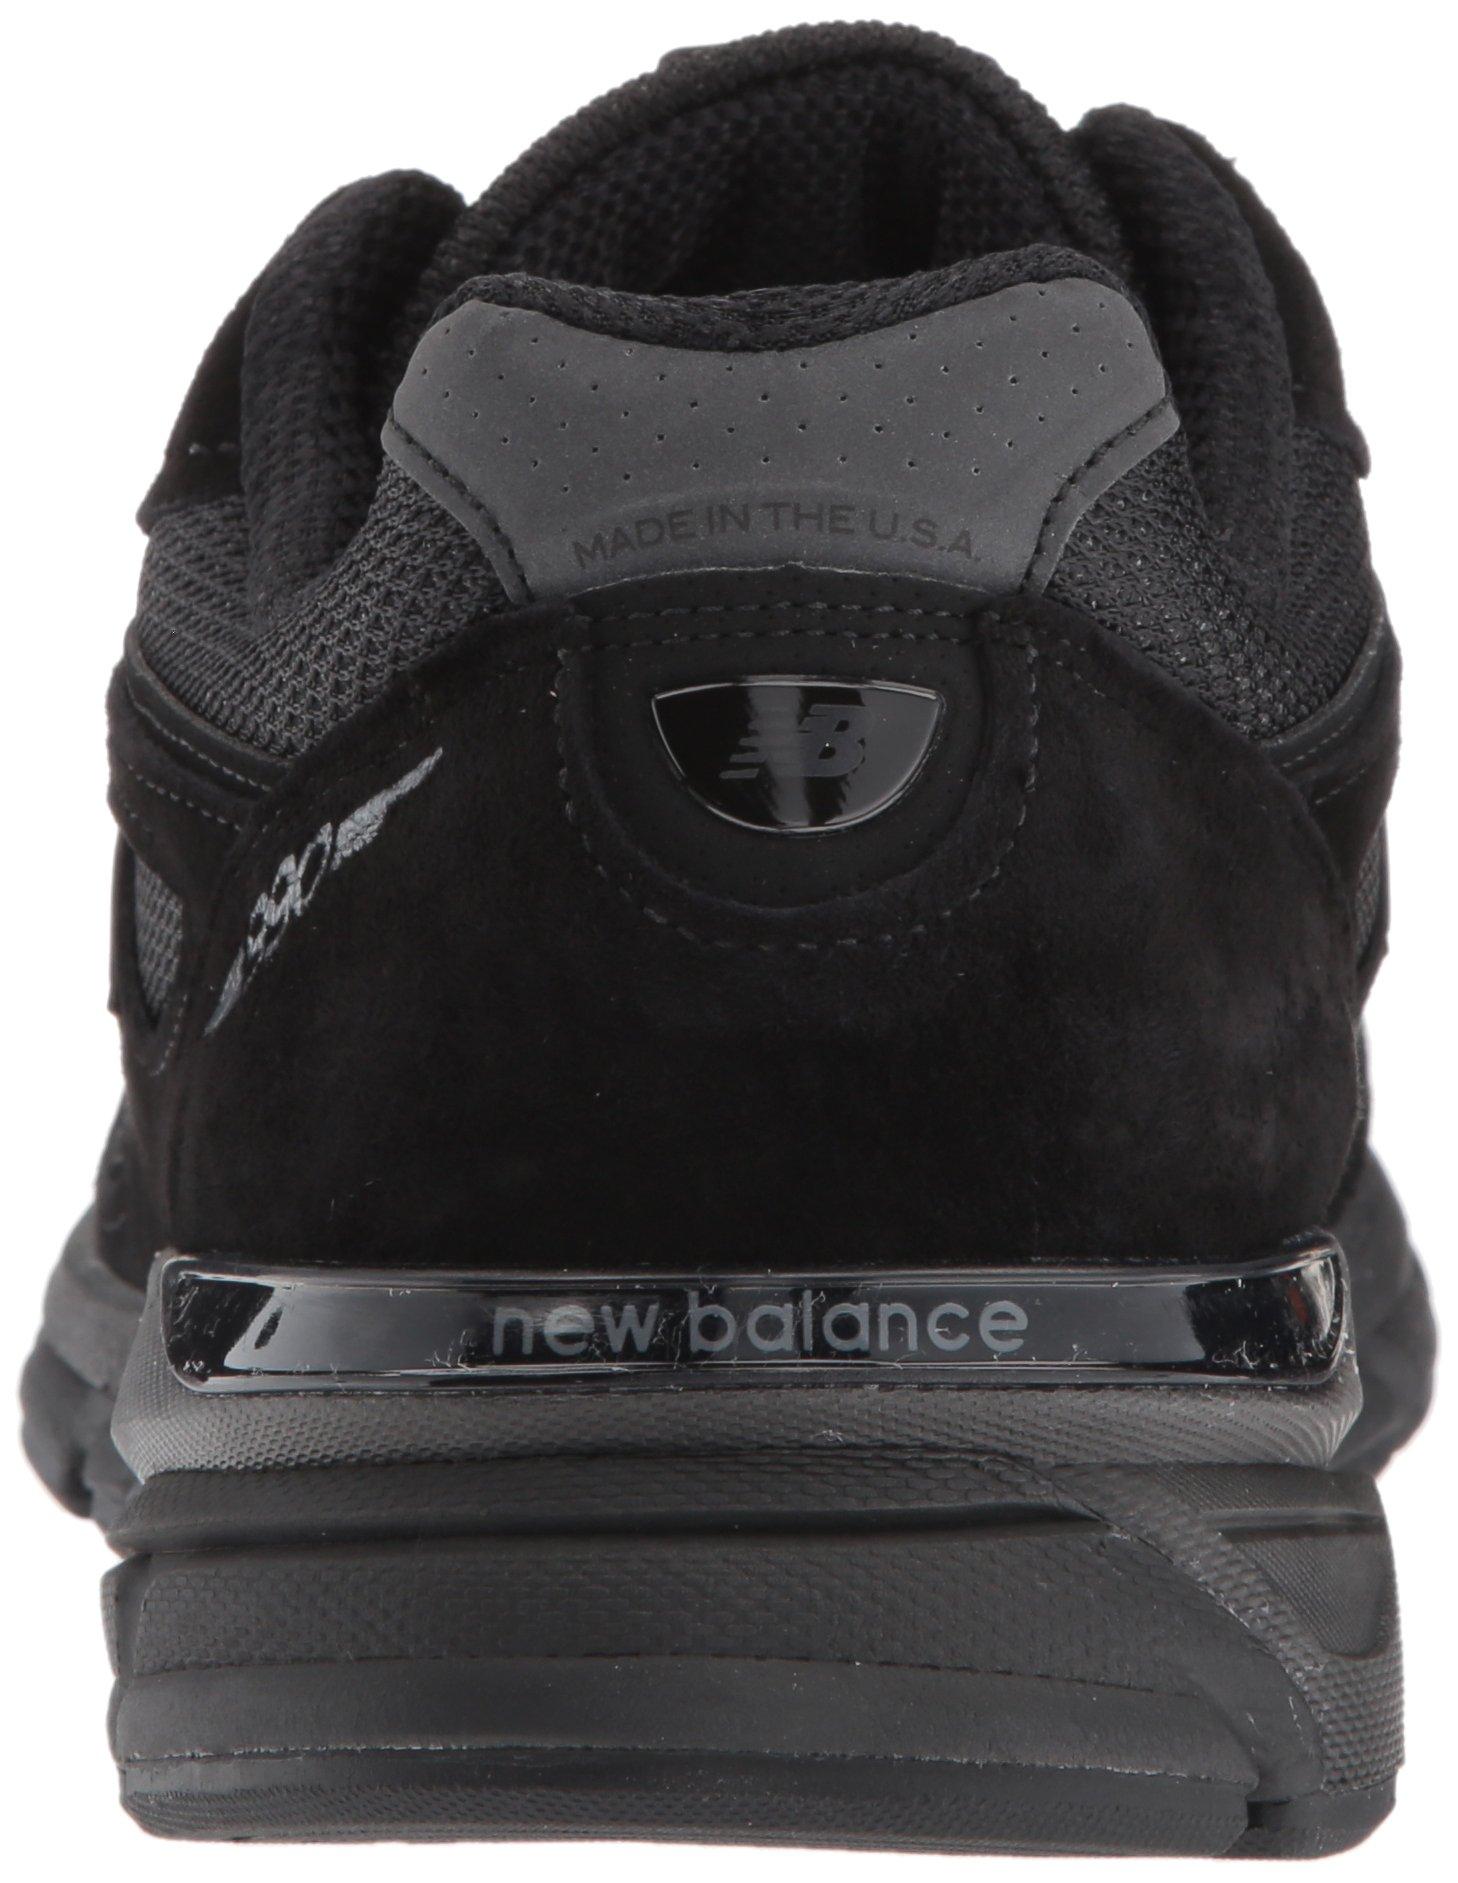 New Balance Men's 990V4 Running Shoe, Black/Black, 11 2E US by New Balance (Image #2)